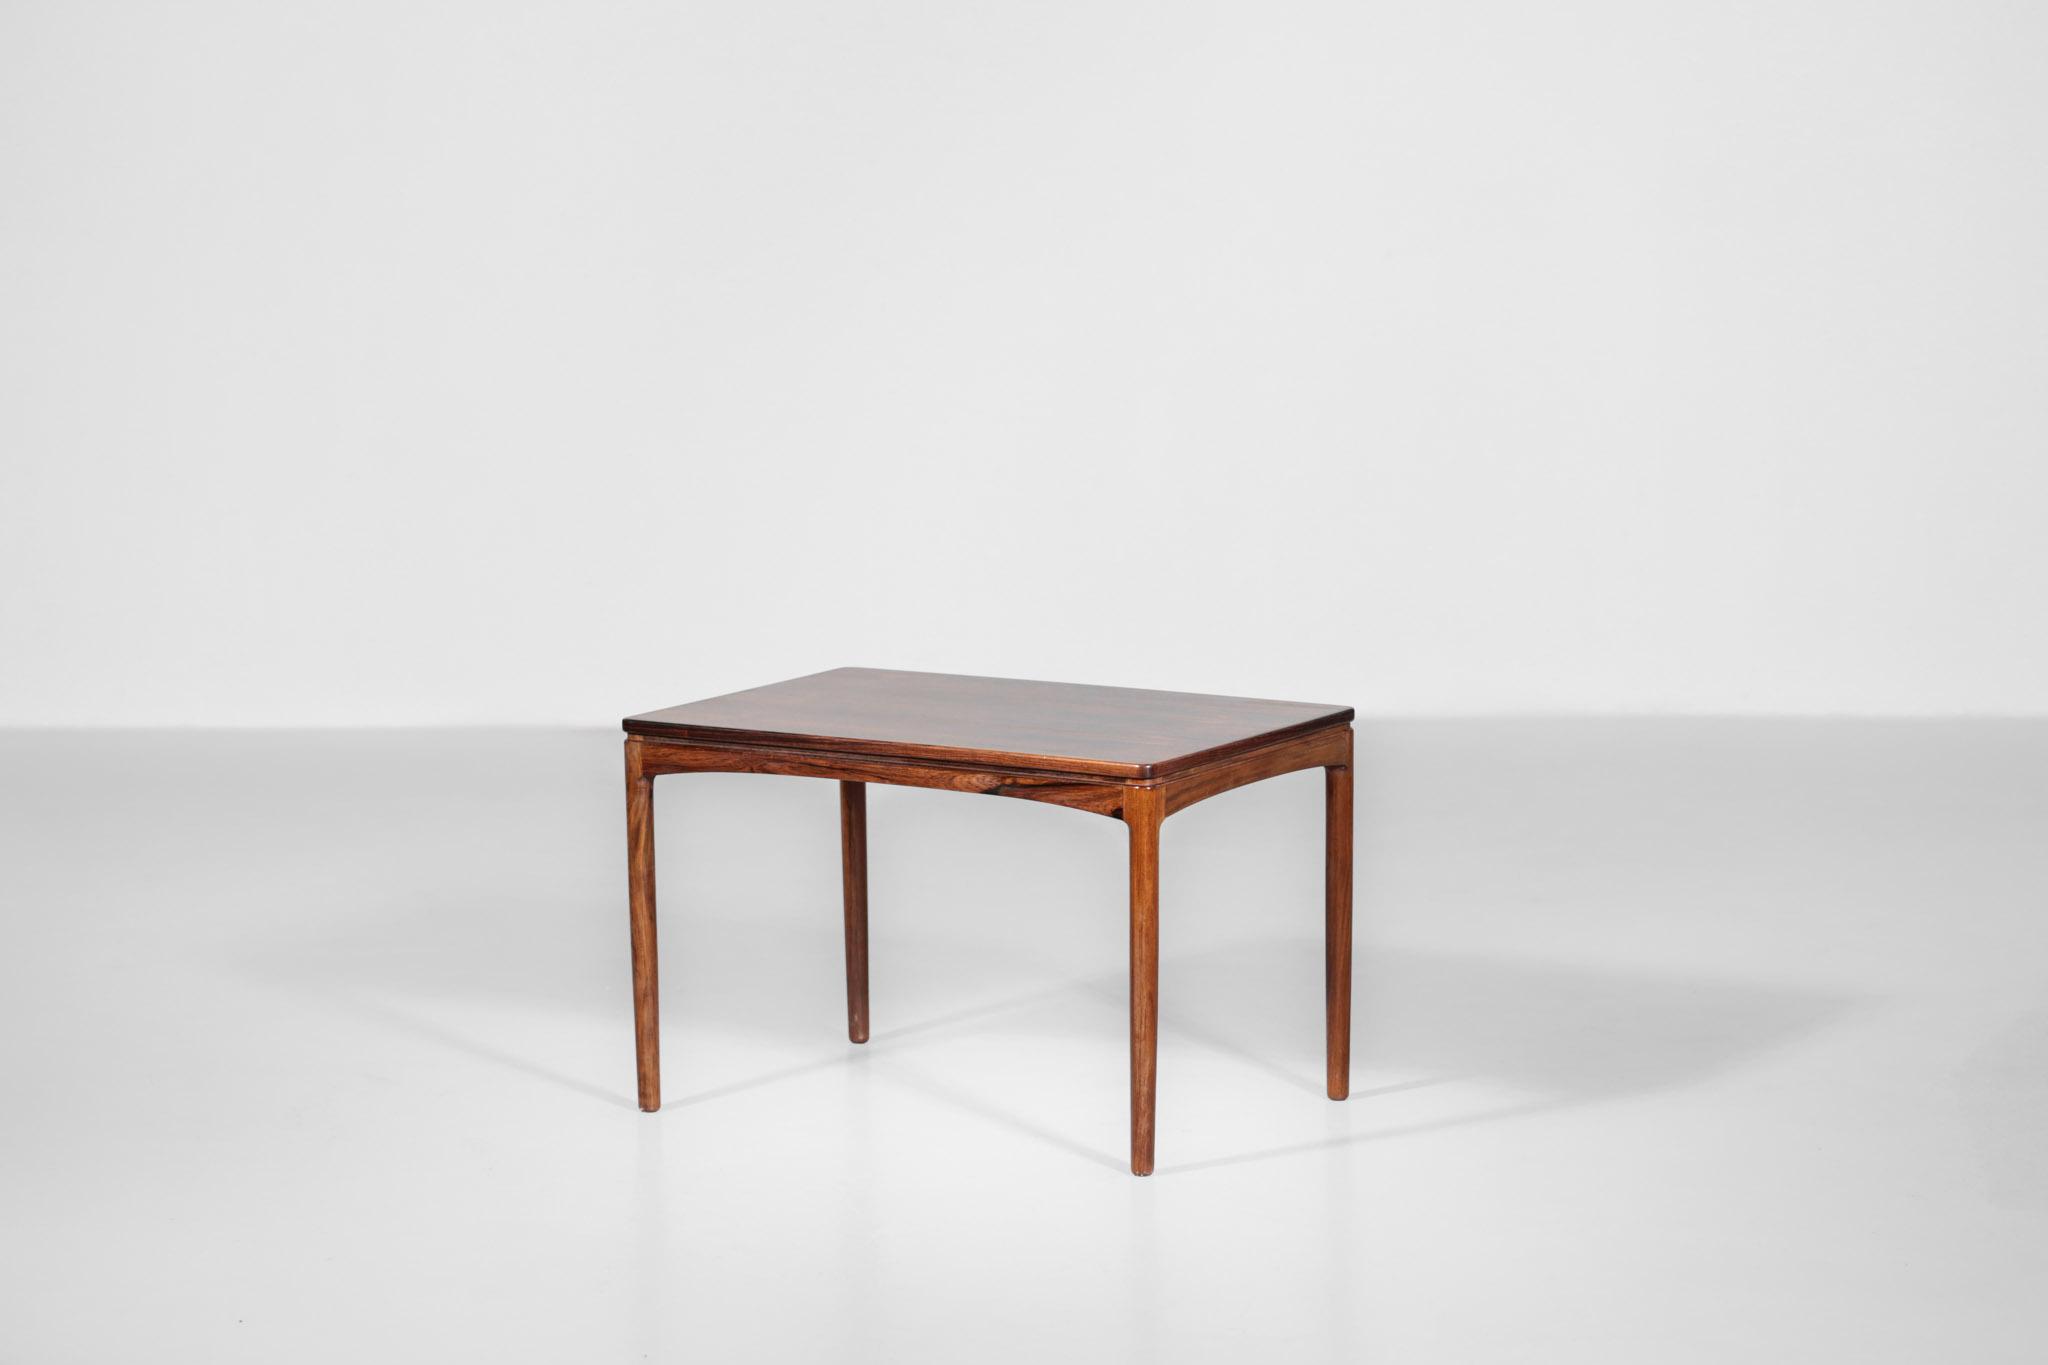 Rosewood Coffee Table By Edmund Jorgensen 1960s Scandinavian Danke Galerie